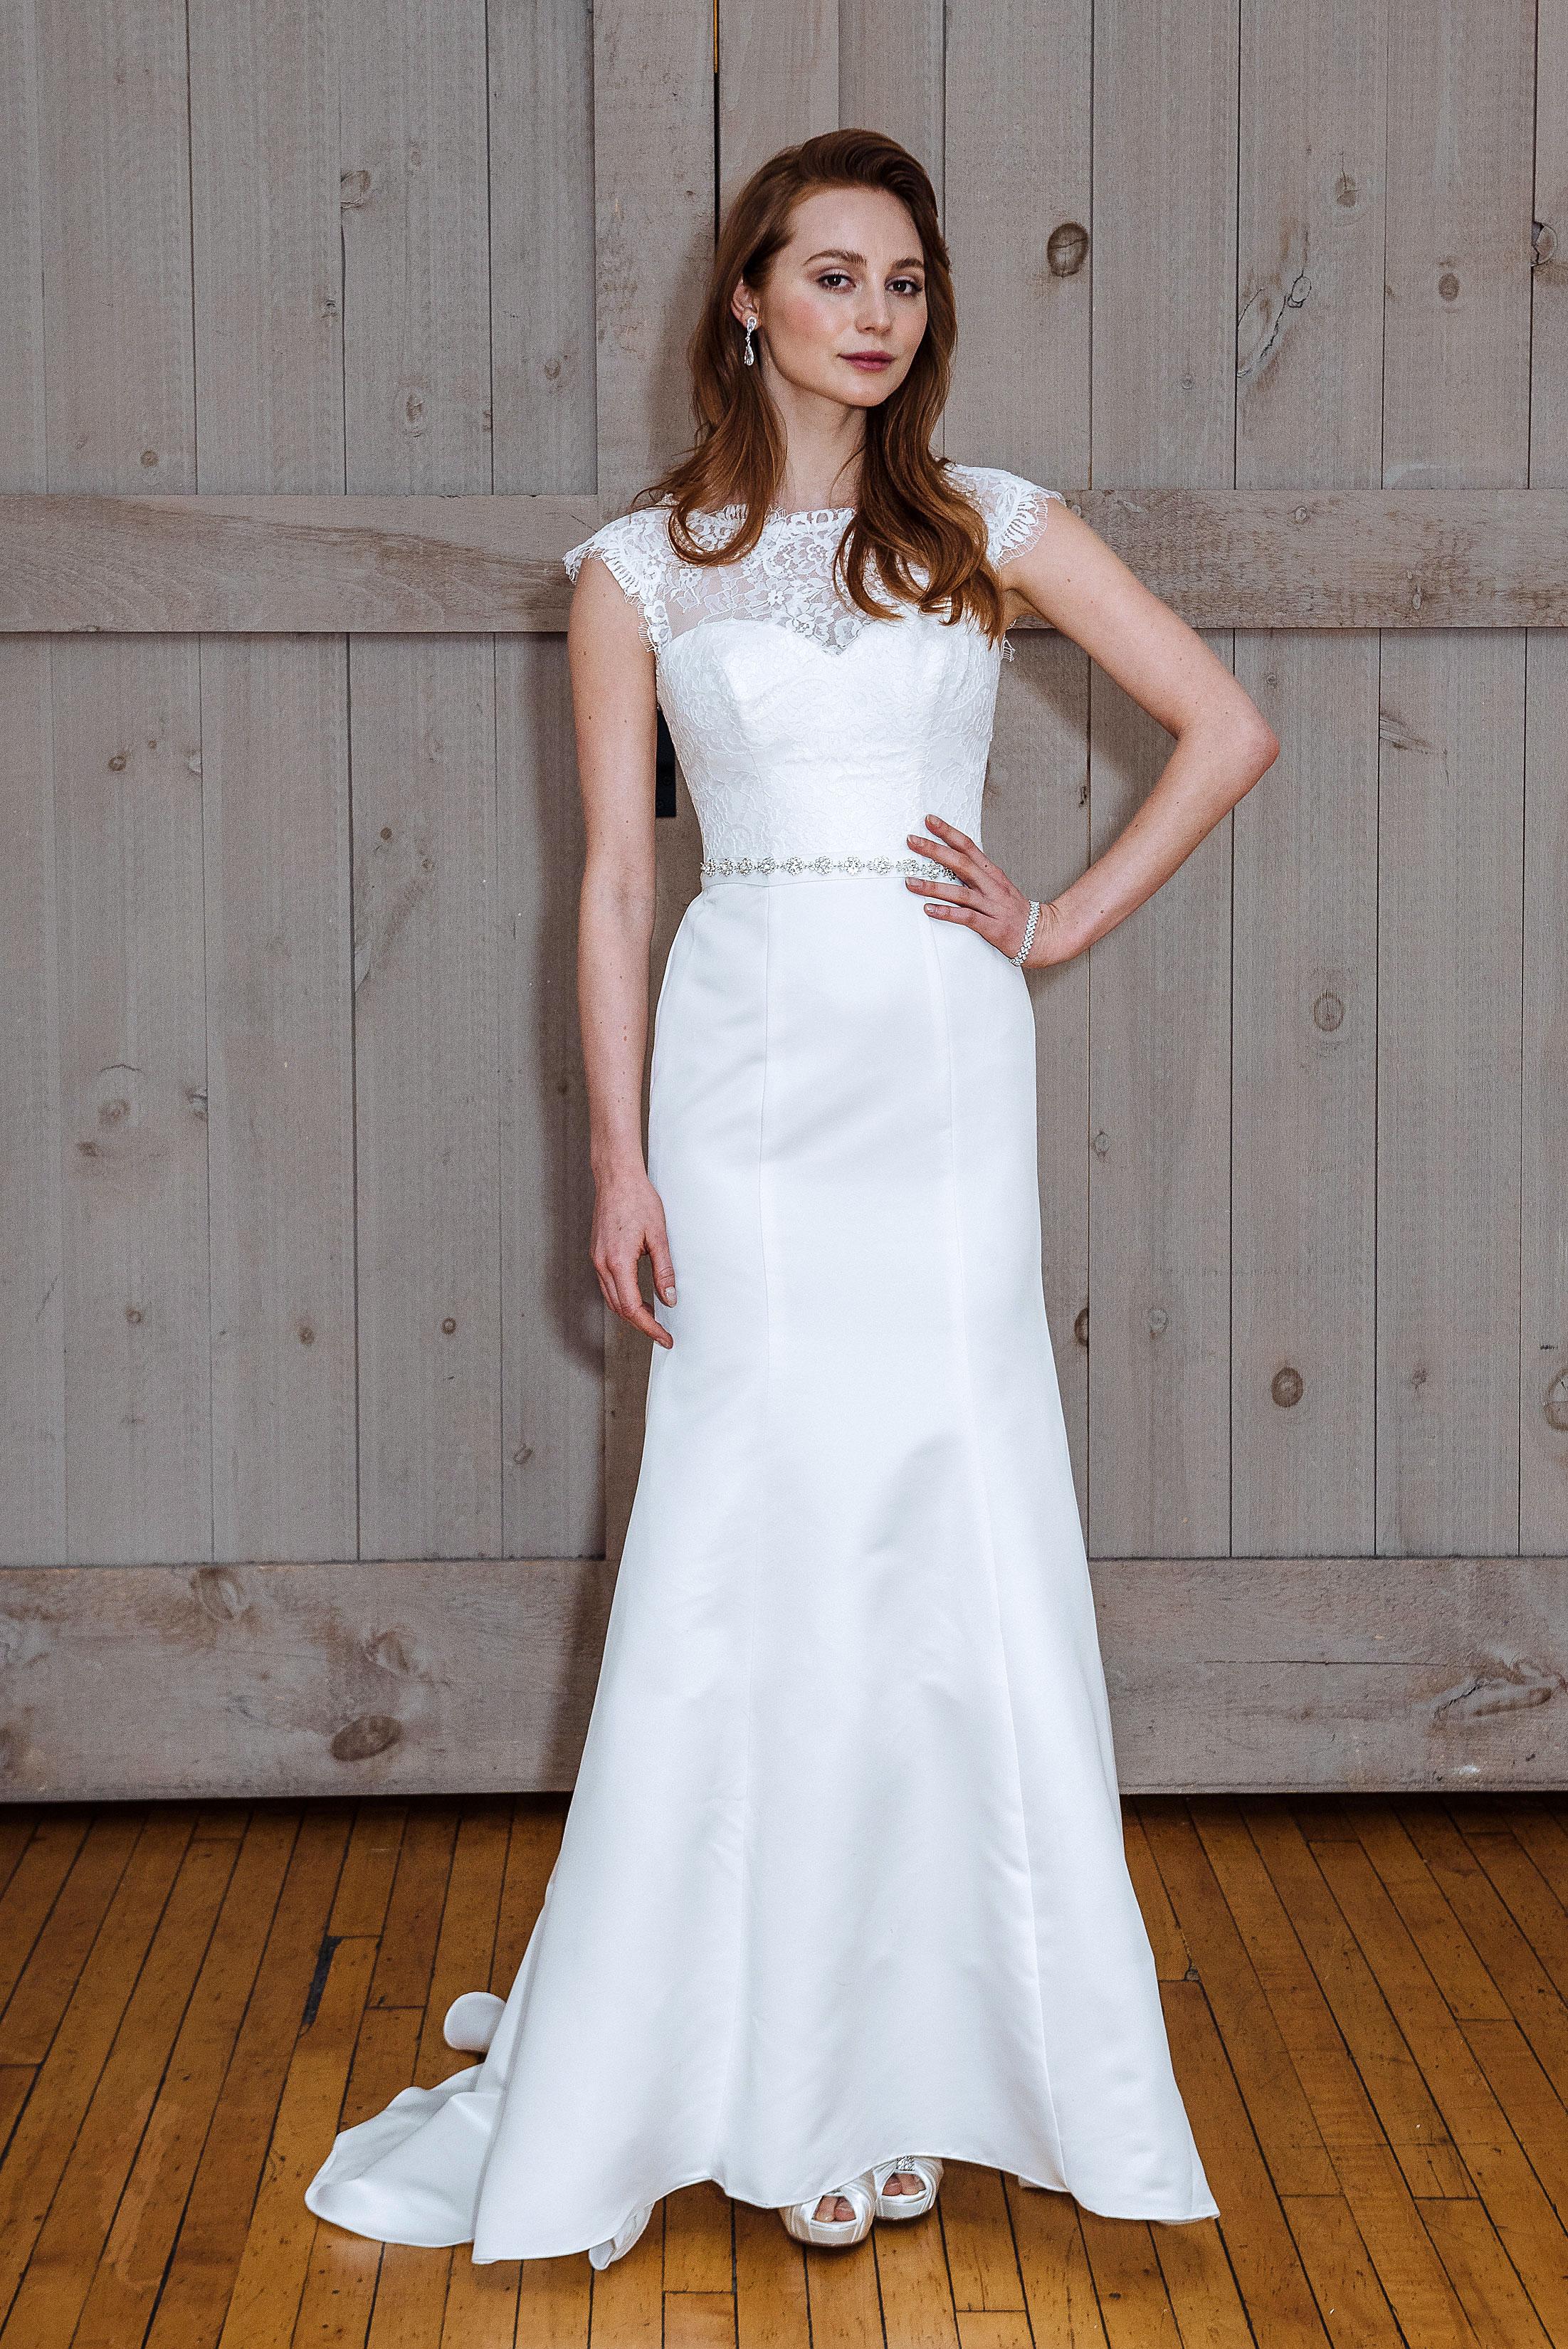 david's bridal cap sleeve wedding dress spring 2018